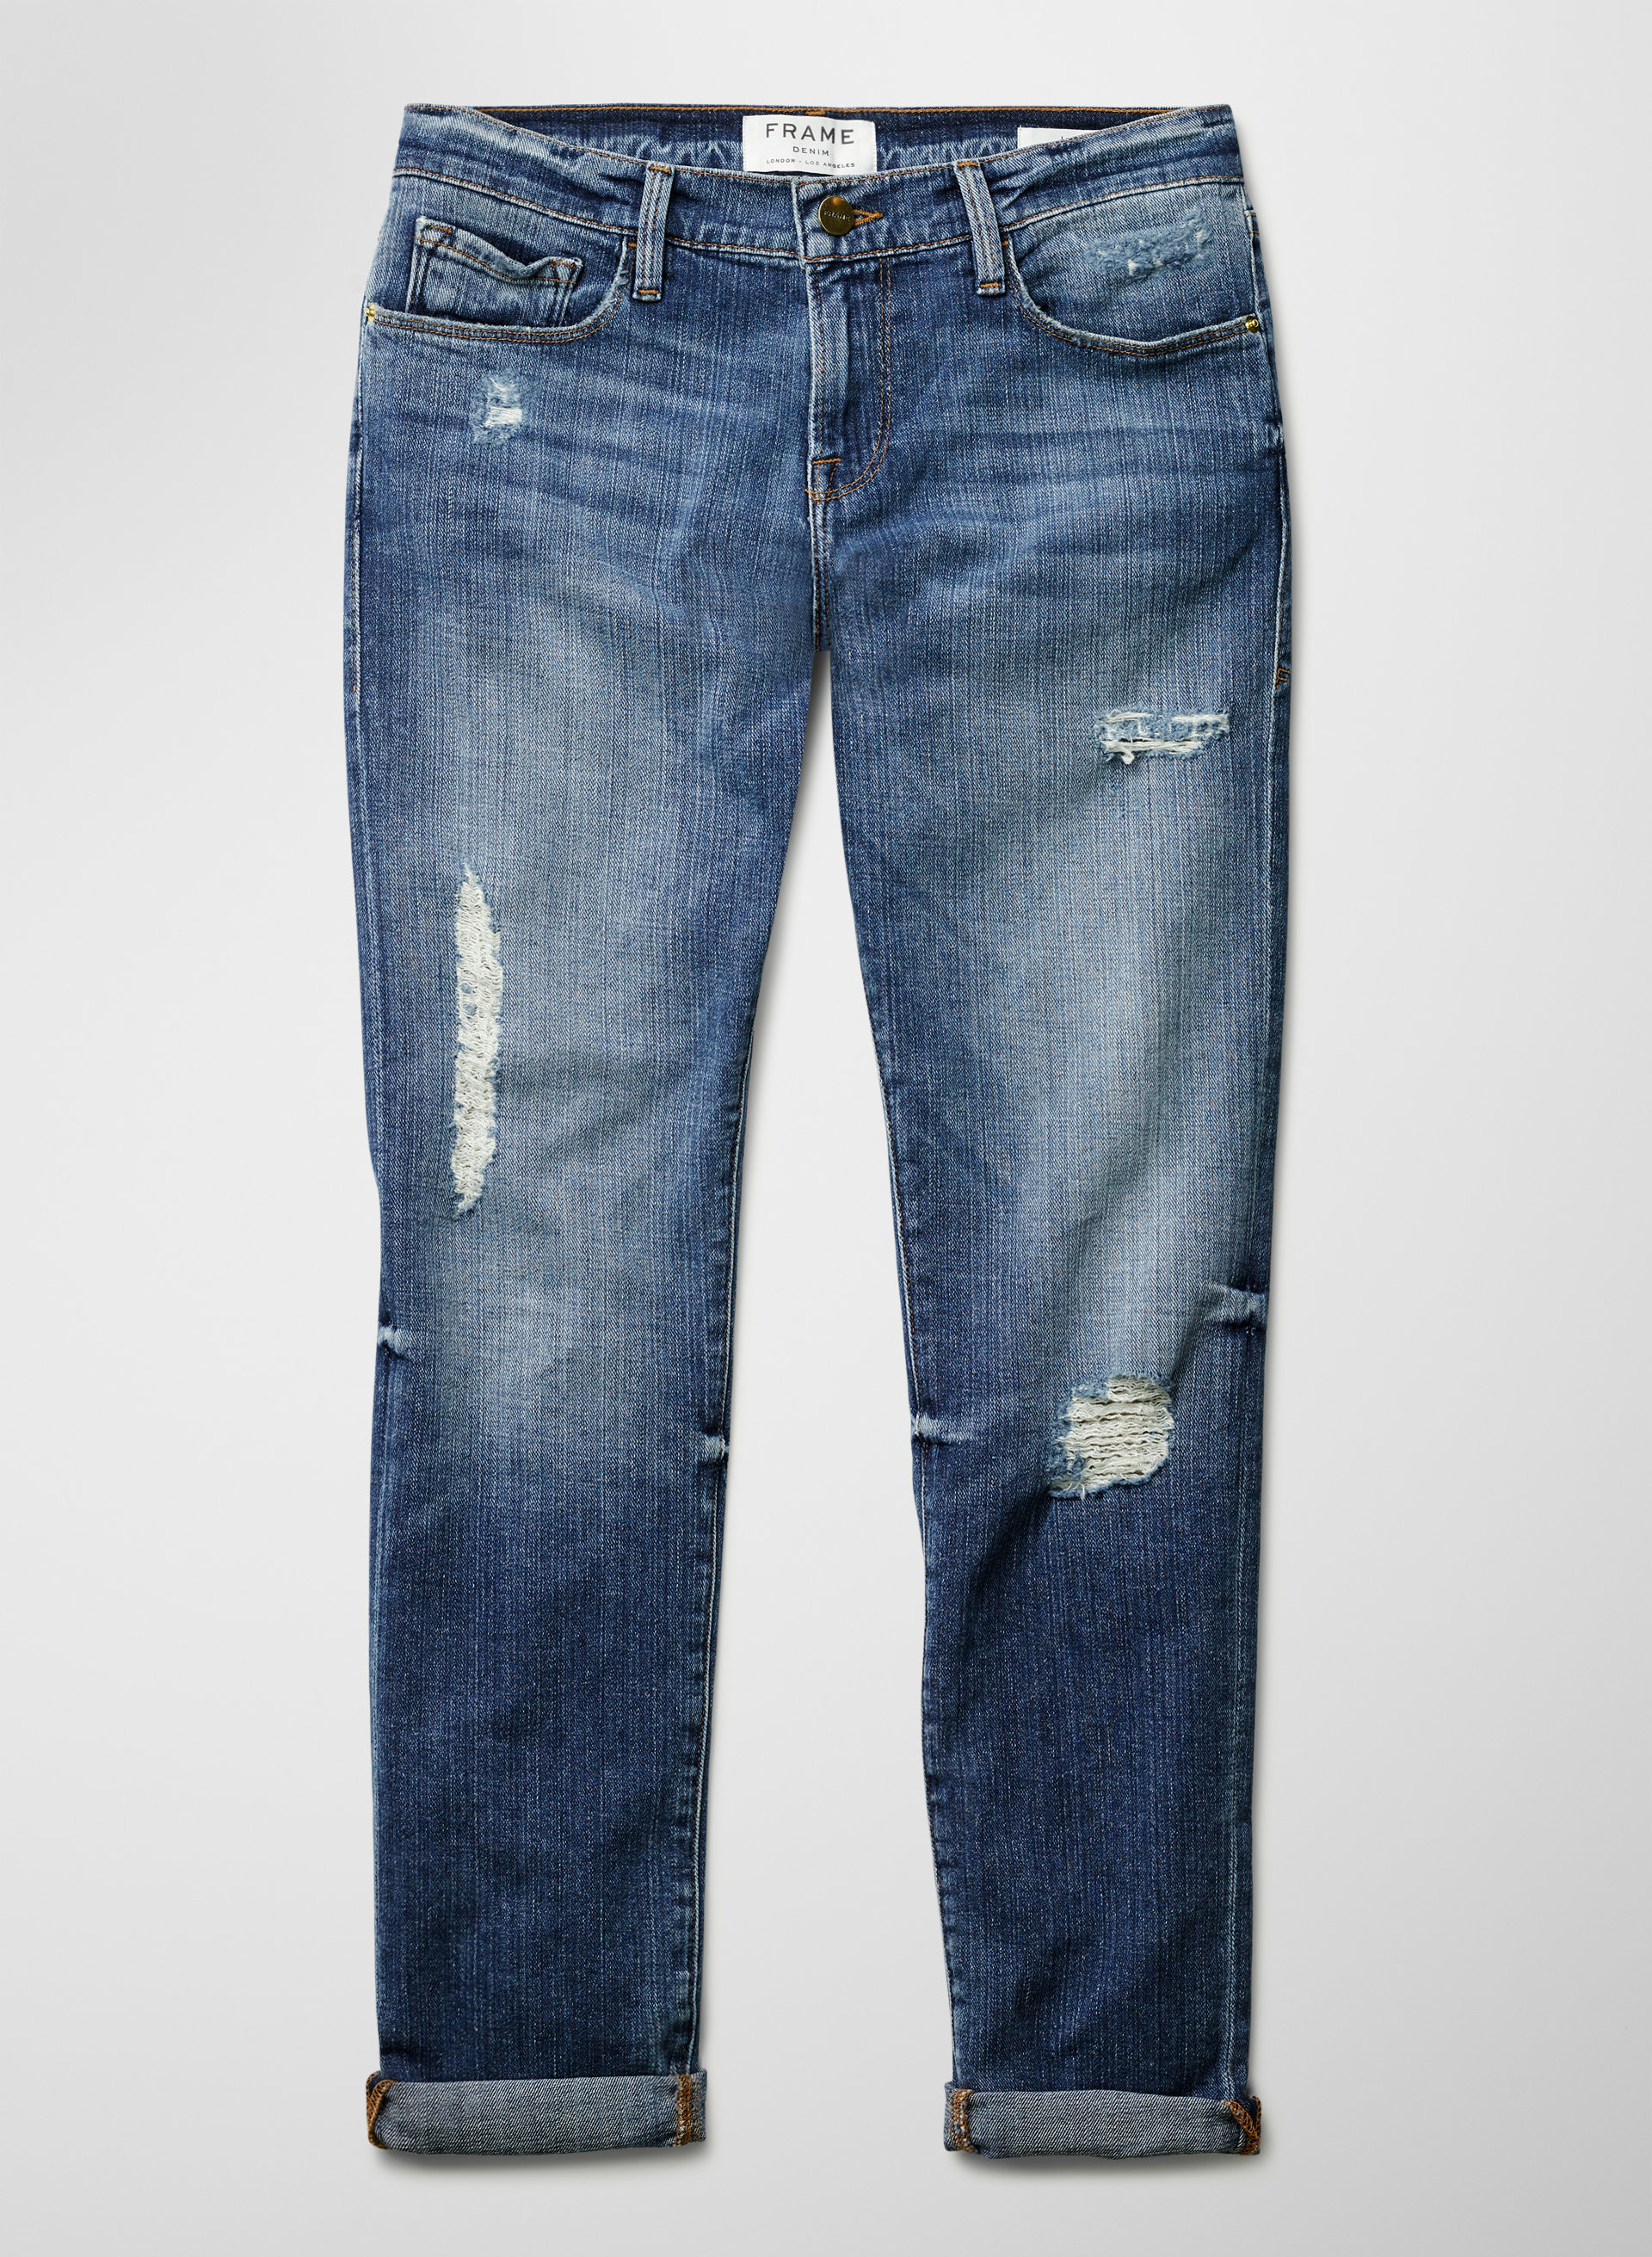 Frame Denim Le Garcon Jean